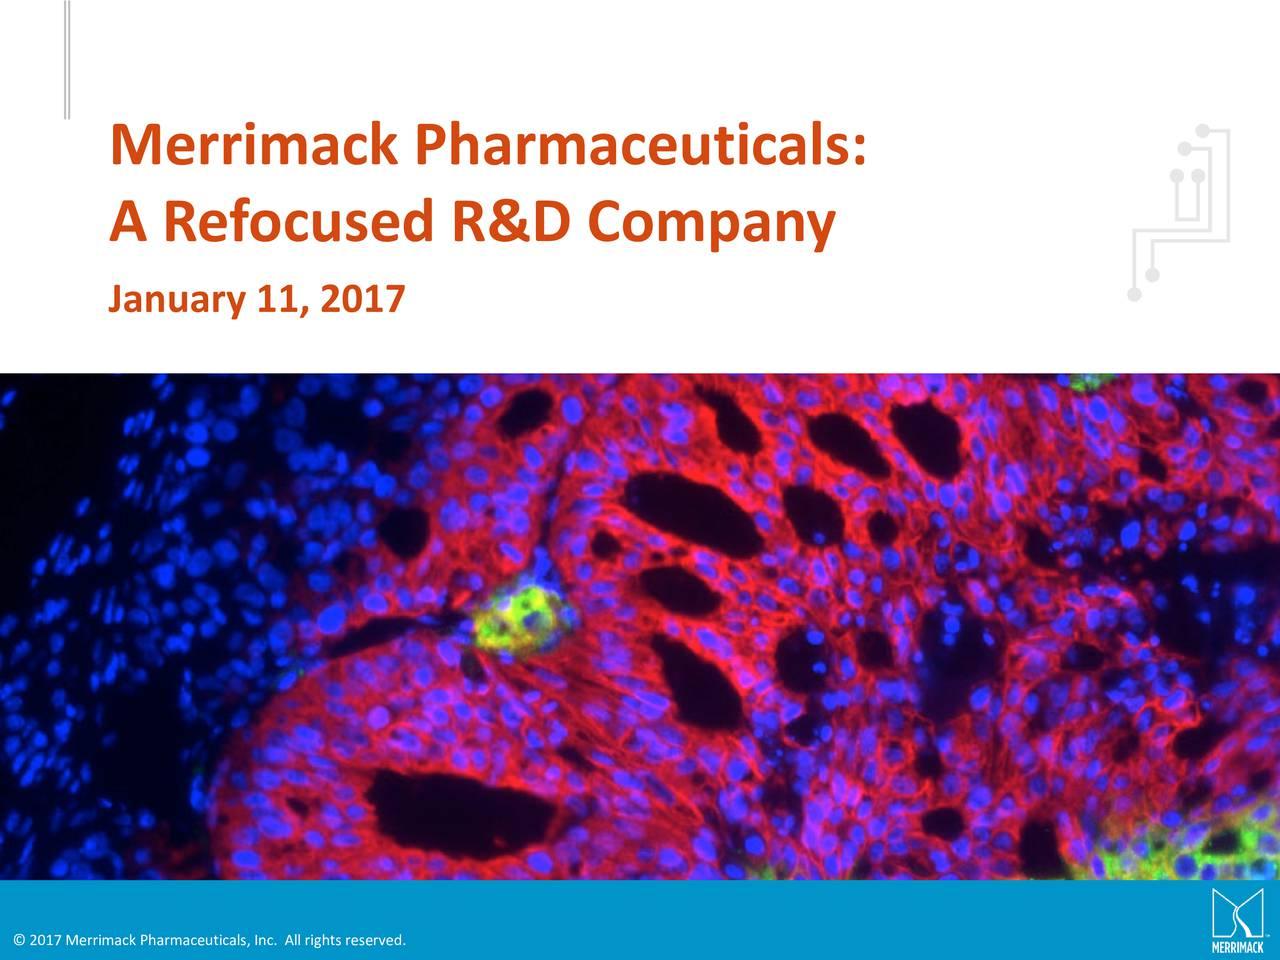 A Refocused R&D Company January 11, 2017